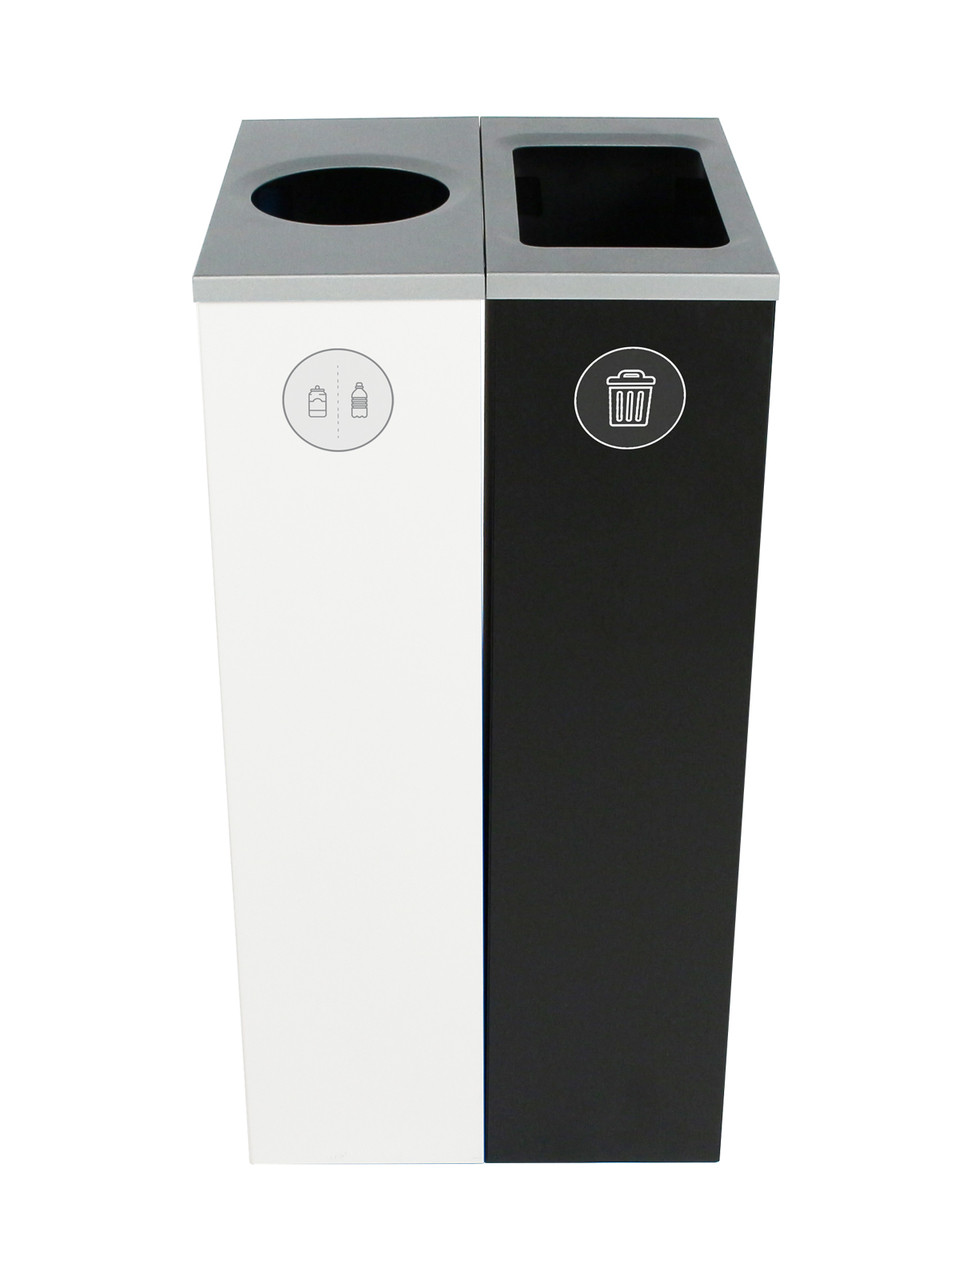 20 Gallon Spectrum Slim Dual Trash Can & Recycle Bin White/Black 8107096-14